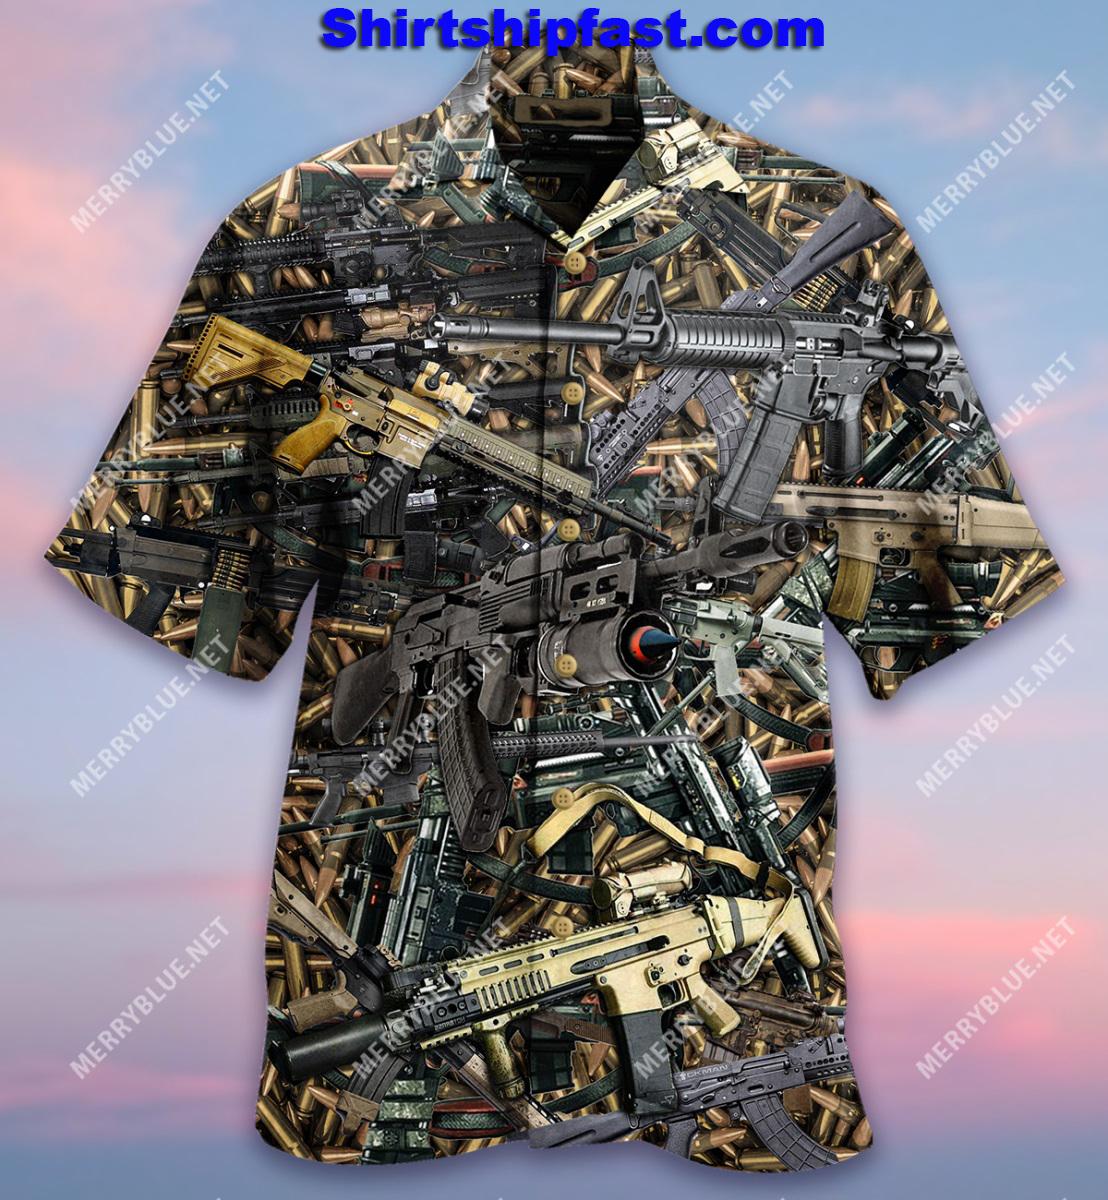 The quickest way to a mans heart is 2970 feet per second hawaiian shirt